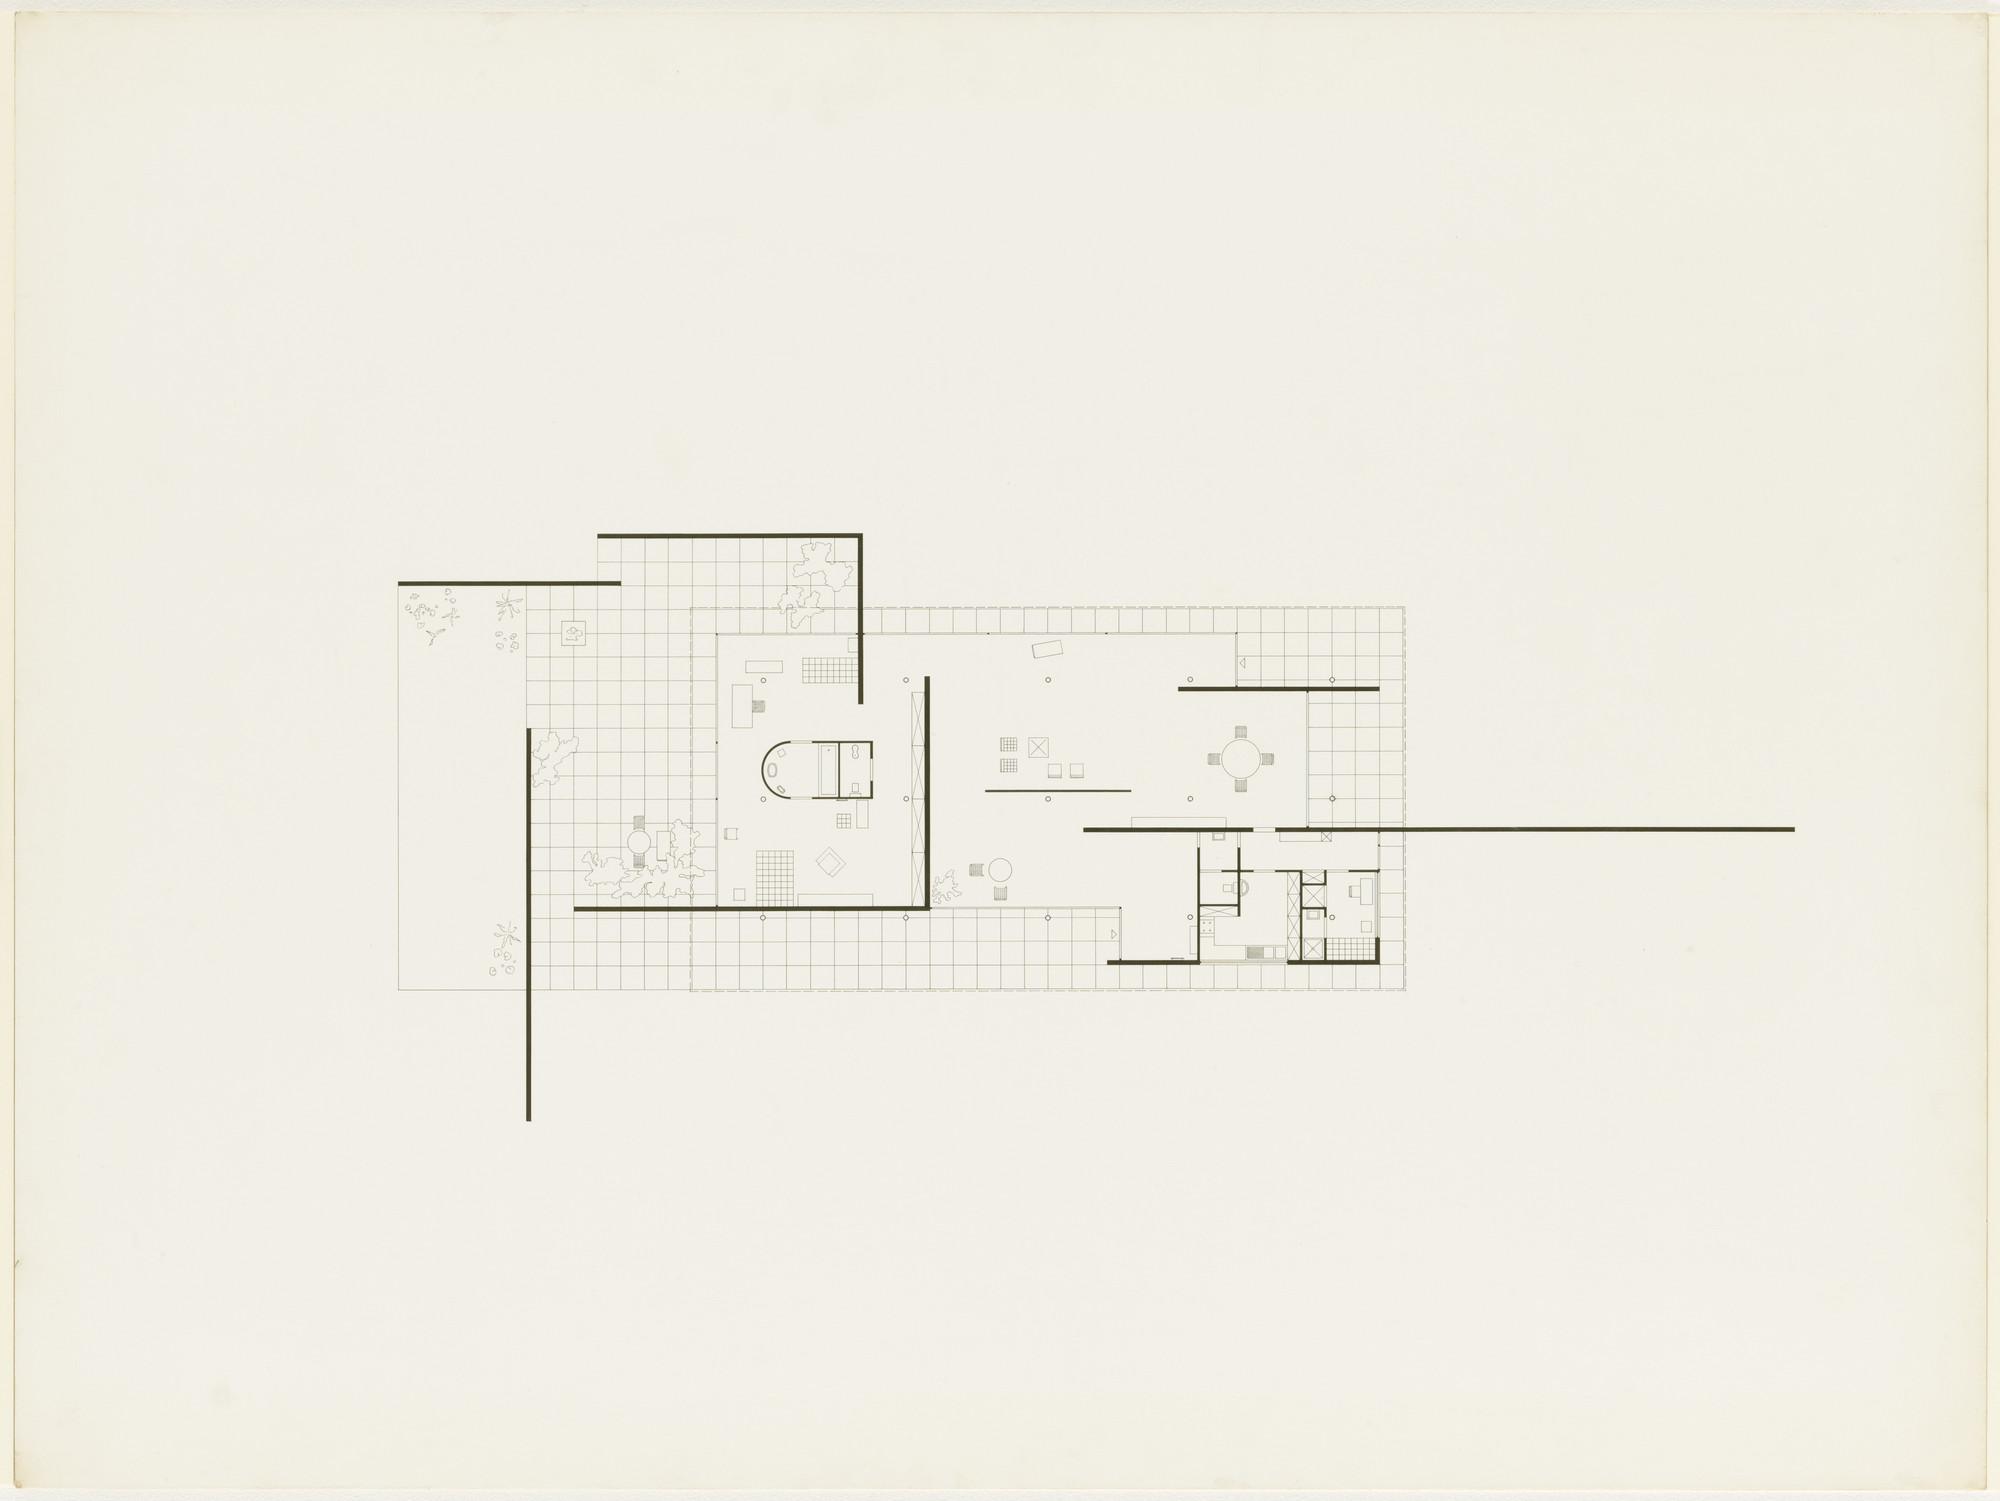 ludwig mies van der rohe exhibition house german building